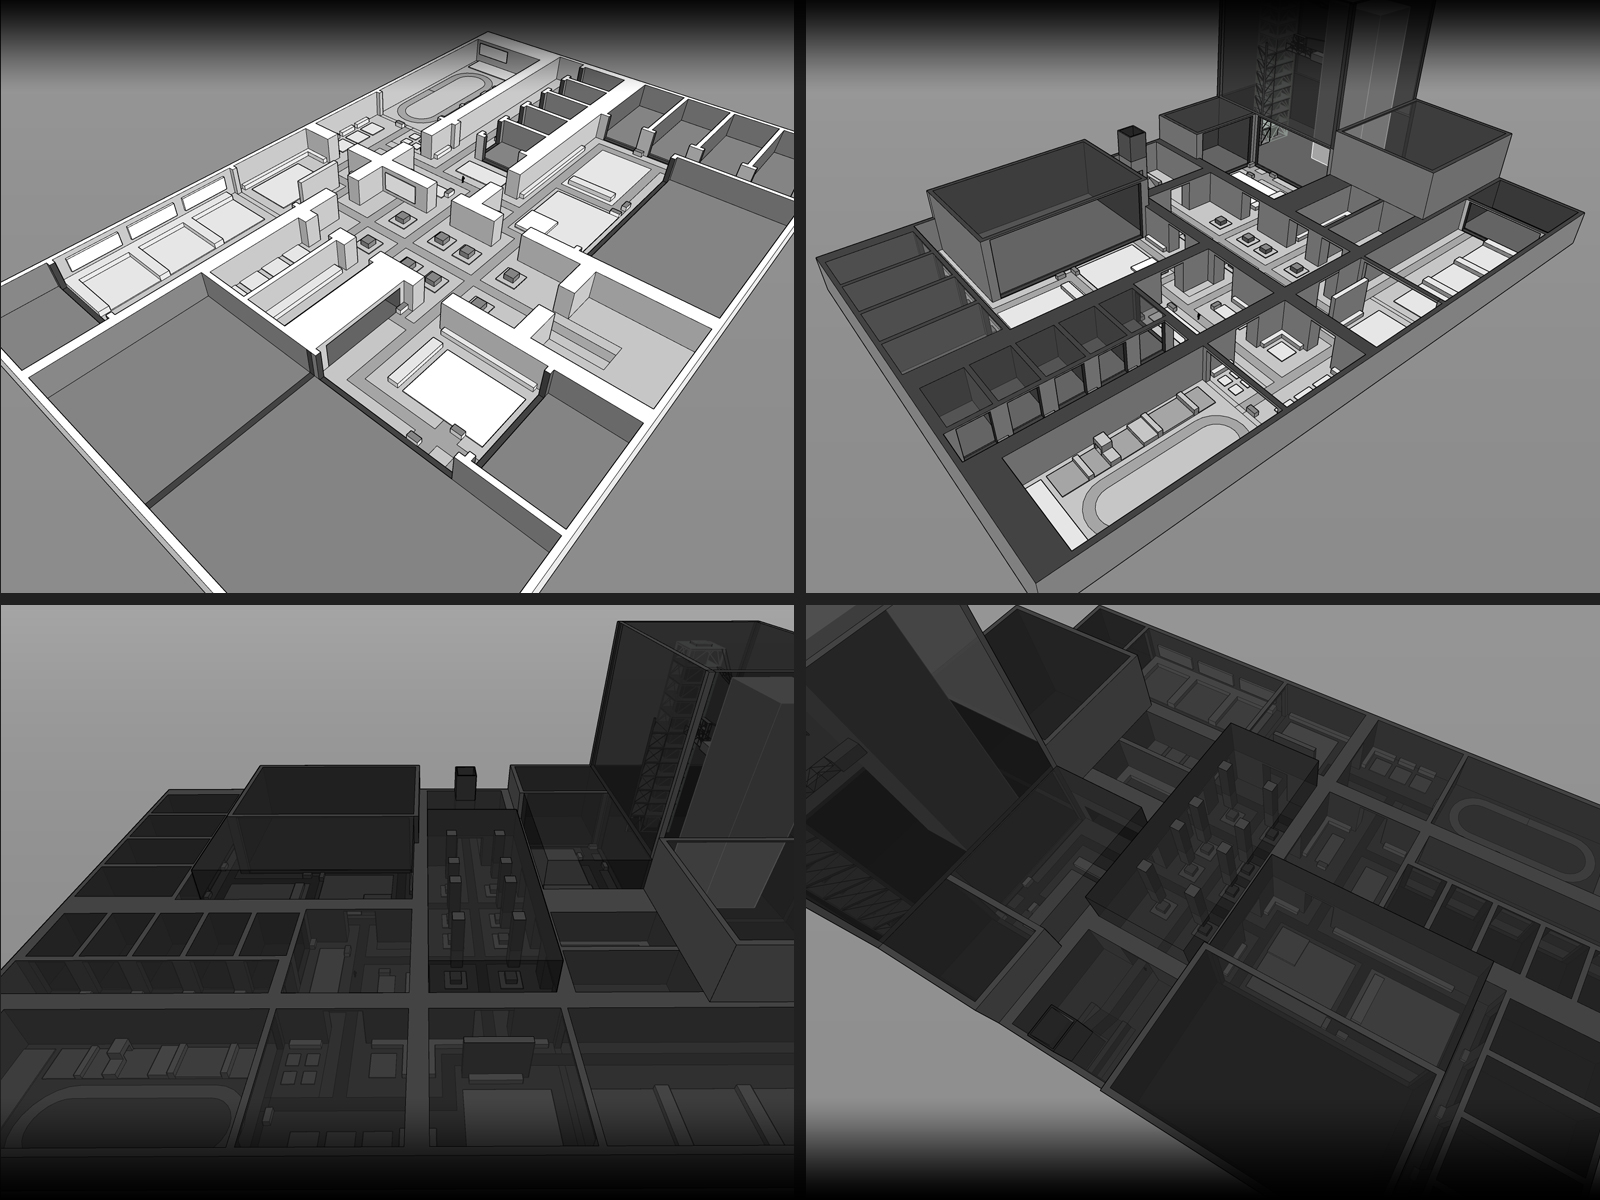 mad-gfx-warehouse-v1-2.jpg